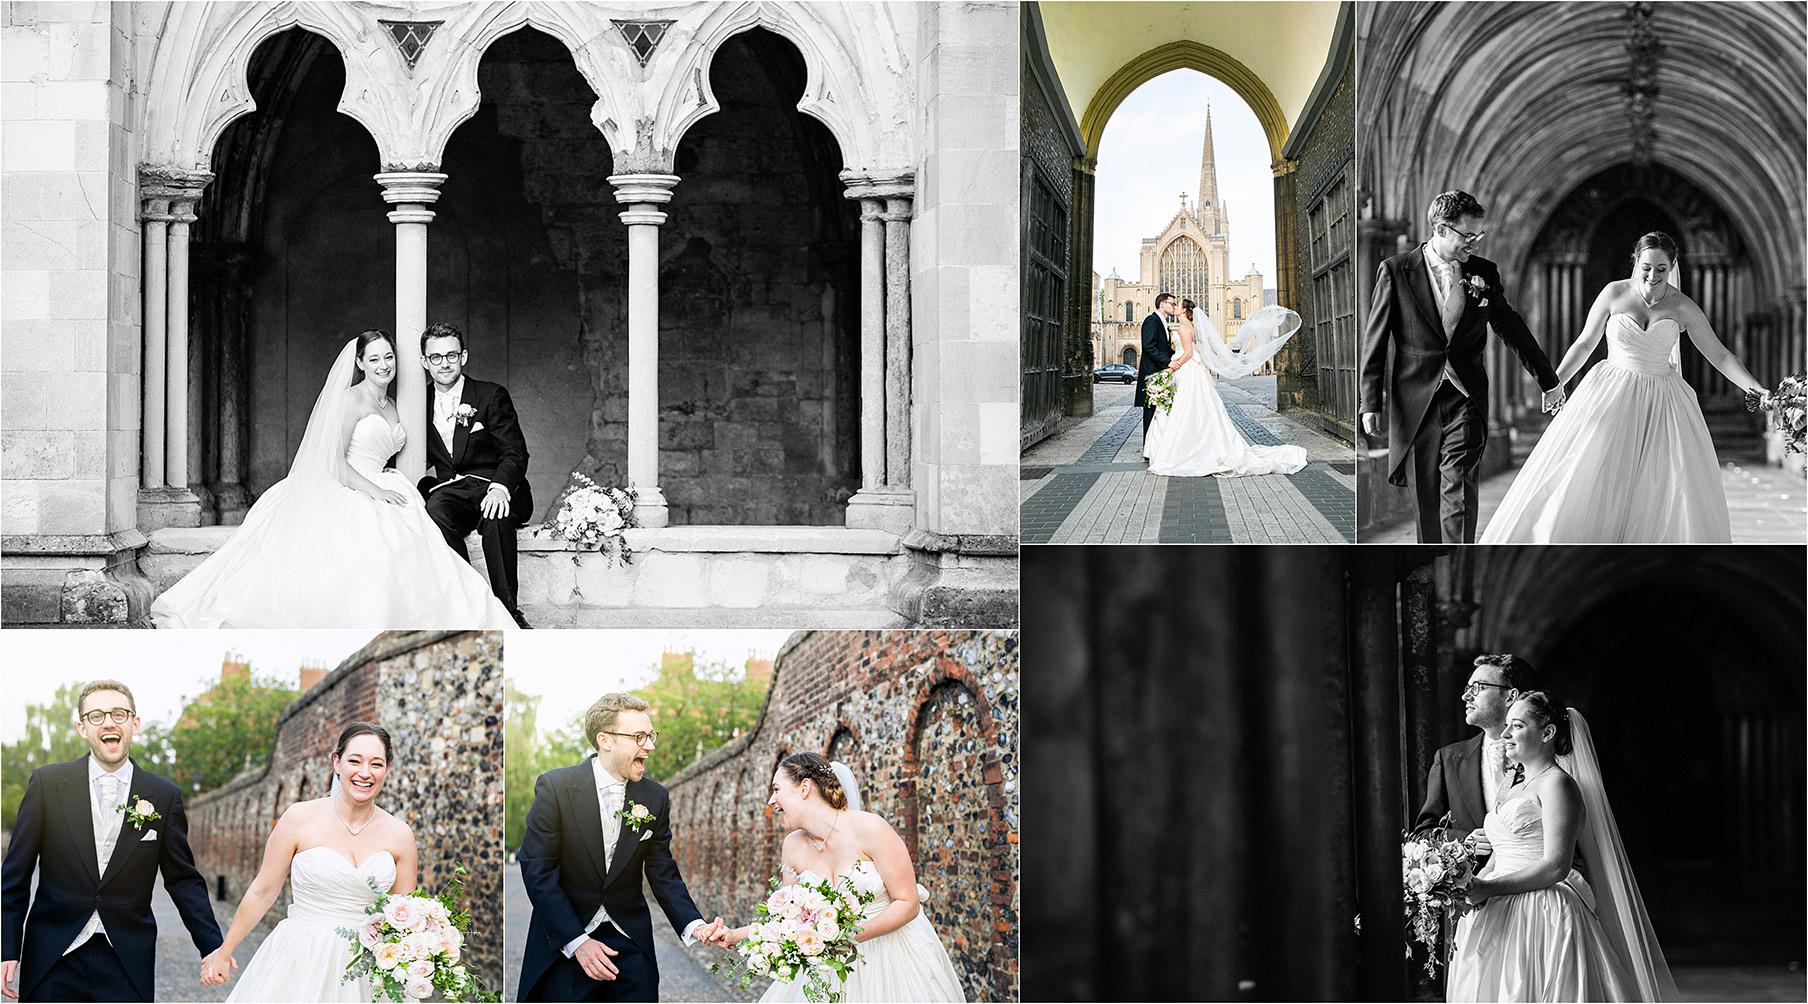 Norwich-weddings-photographer-7.jpg